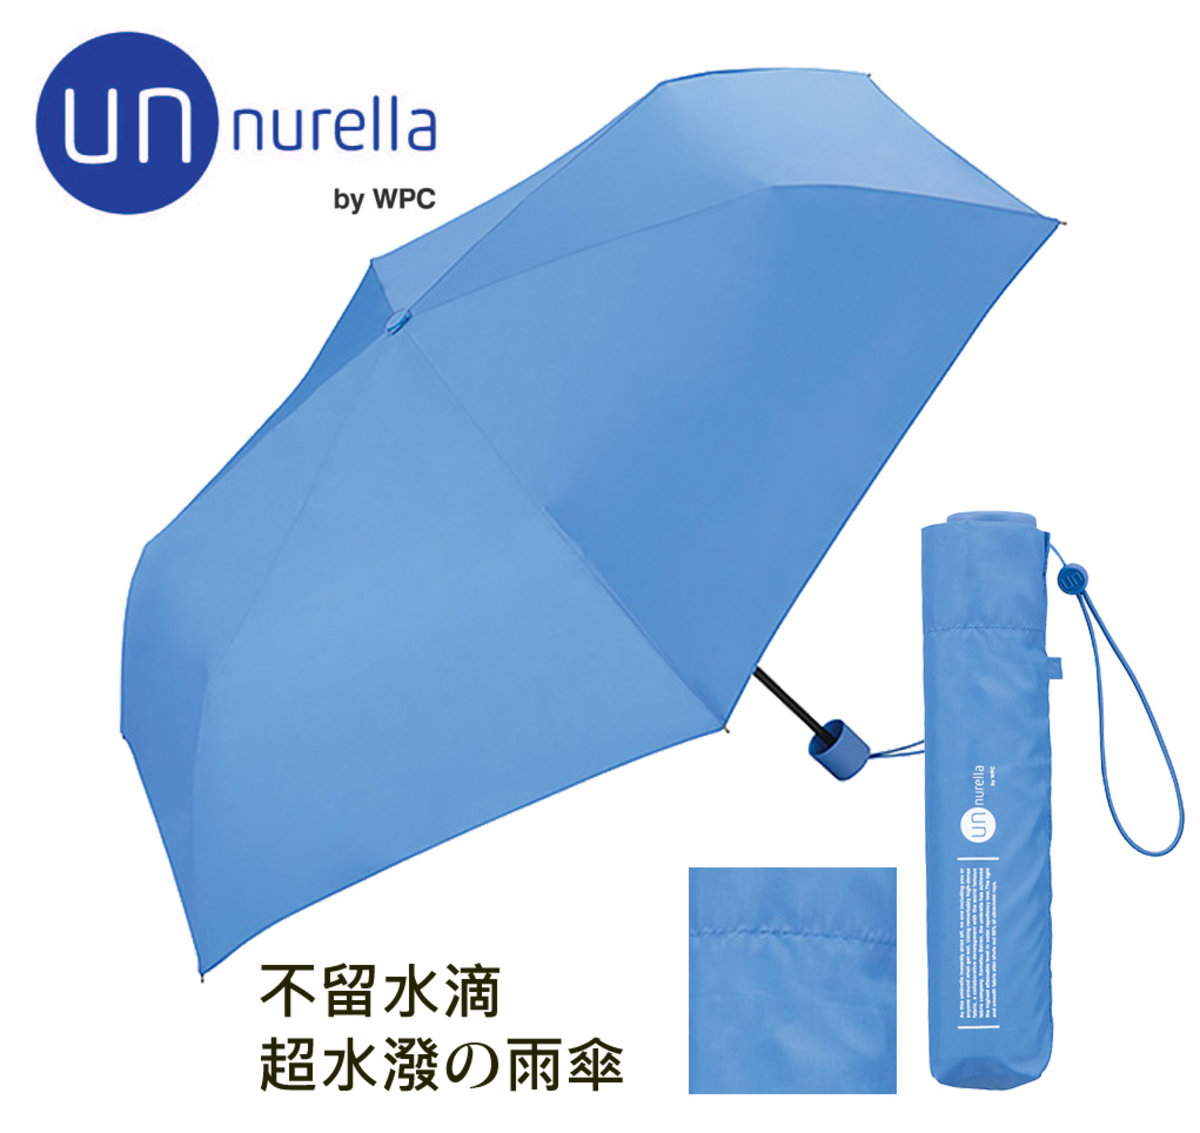 Clear all rain drop in a second ‧ Umbrella specialist from Japan - Unnurella  by WPC UN-106-BL Folding Umbrella